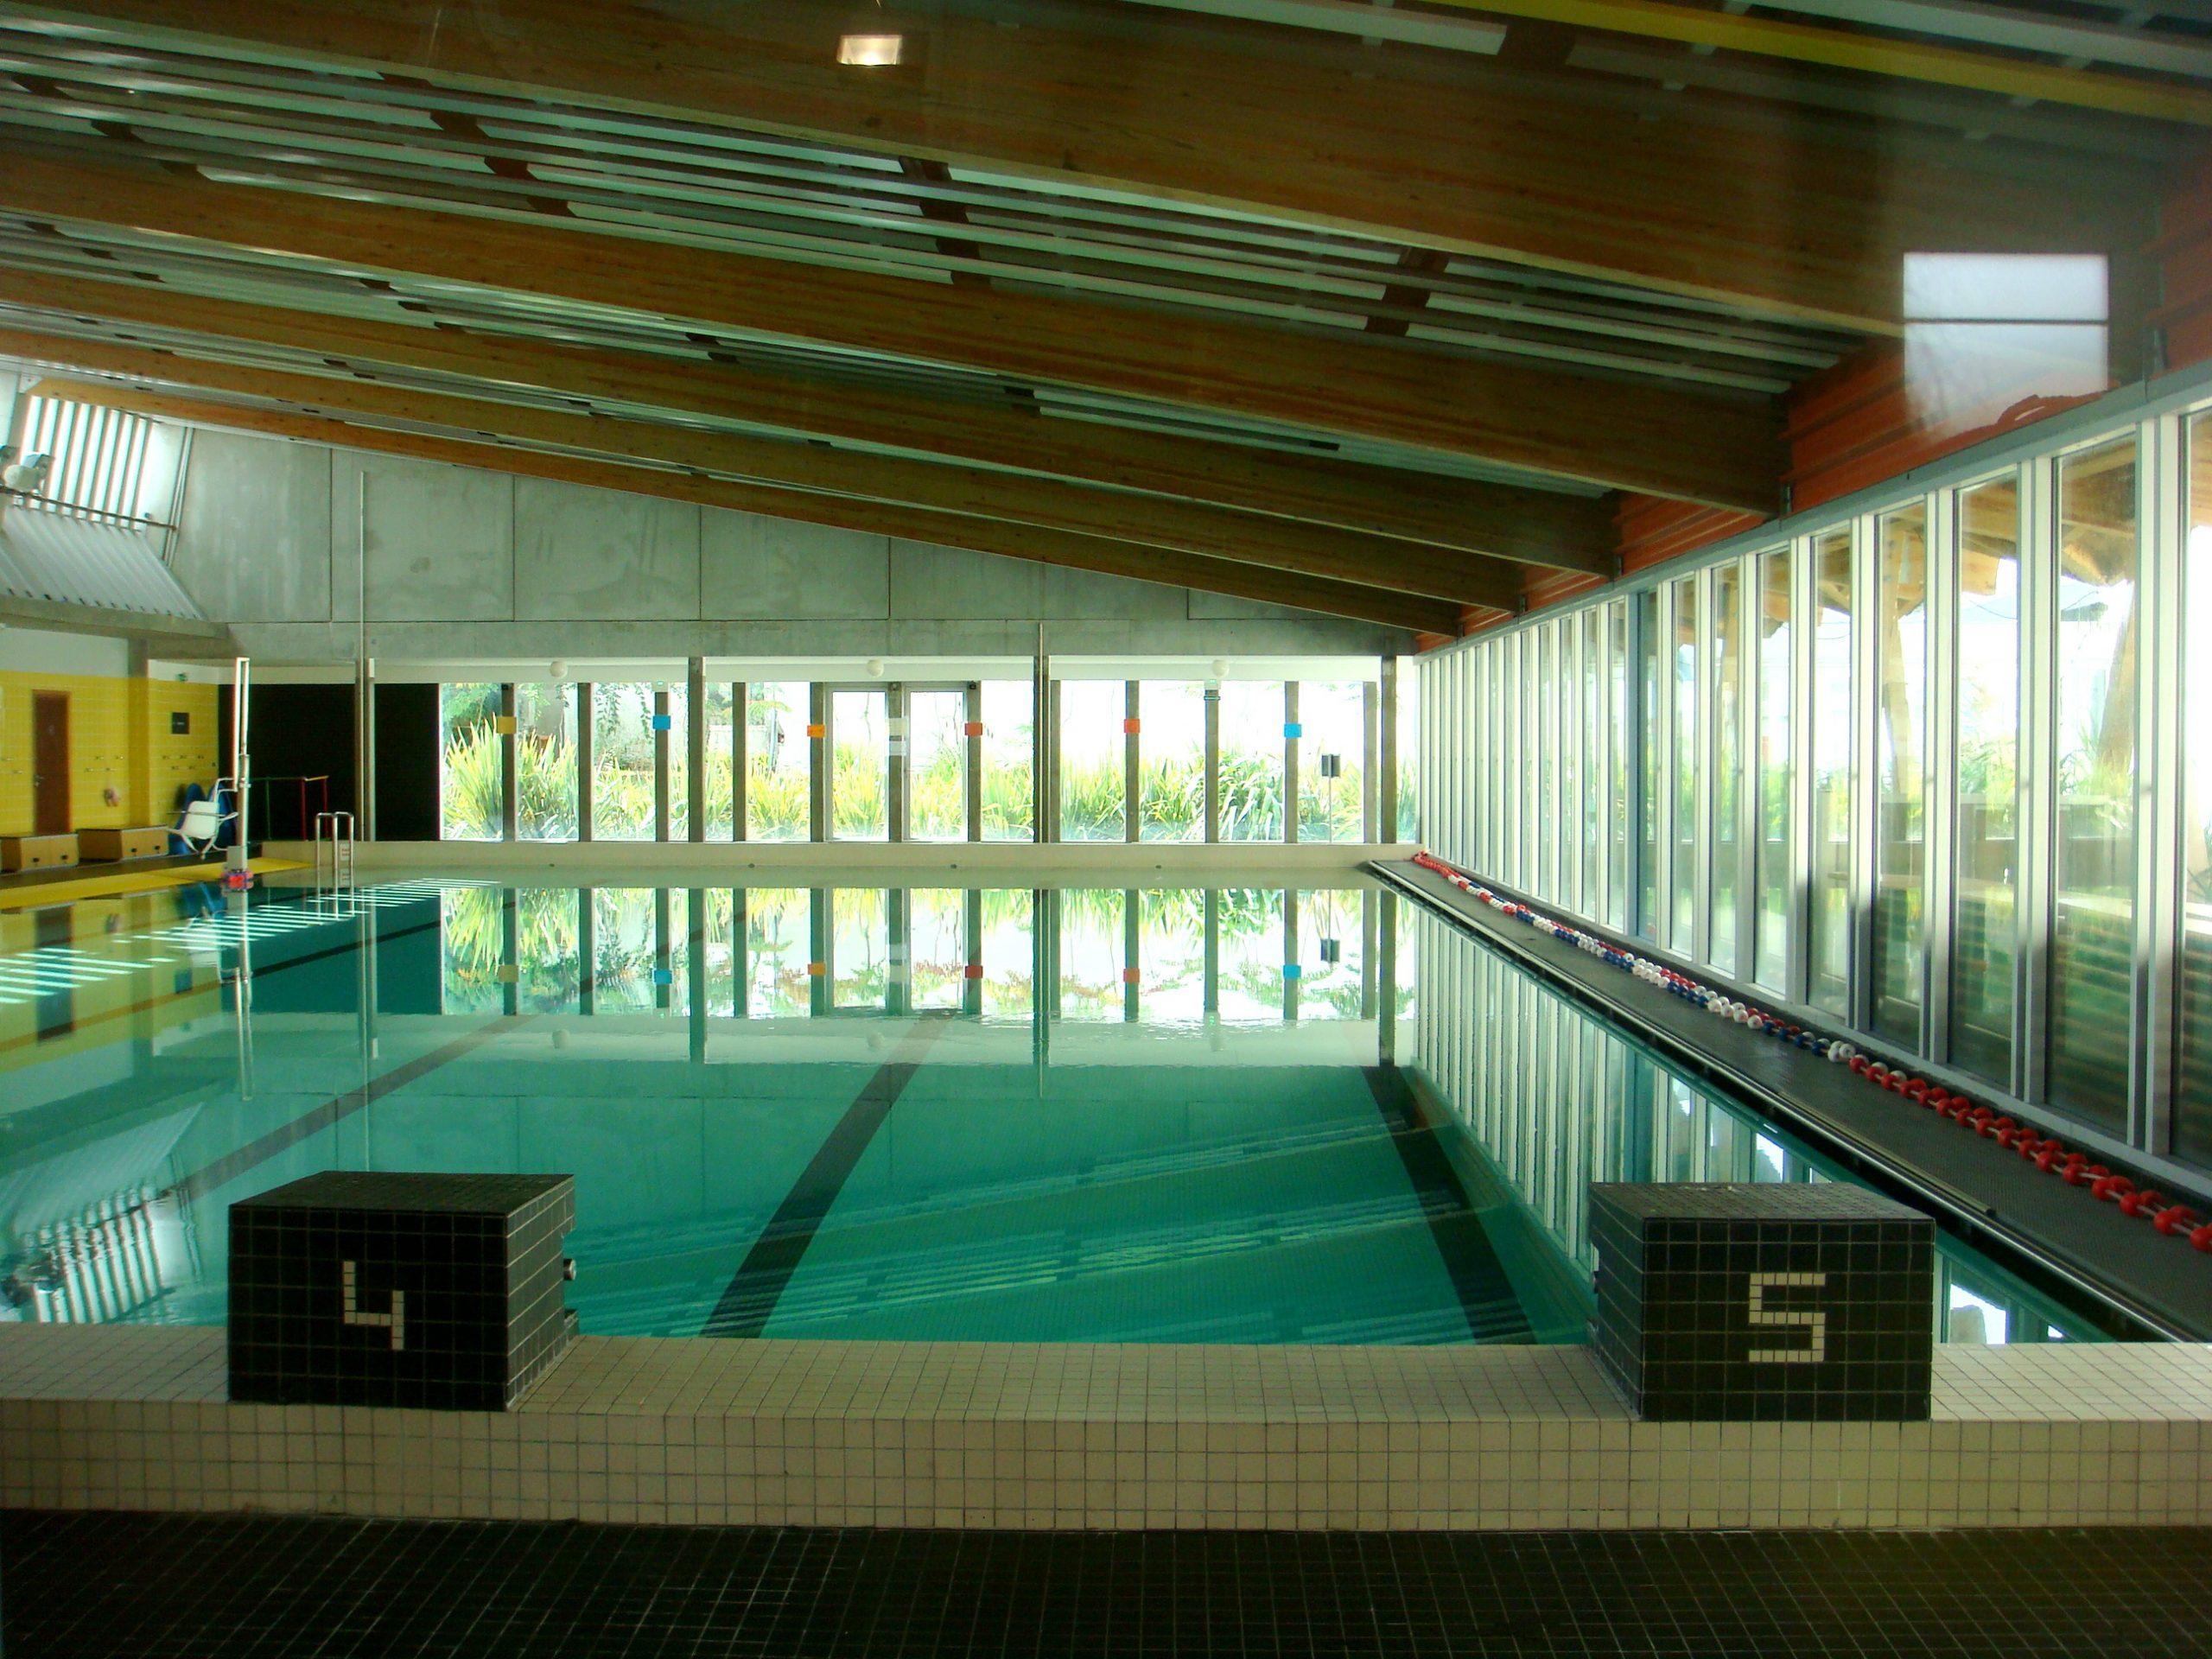 File:piscine Bègles Intérieur.jpg - Wikimedia Commons avec Piscine Begles